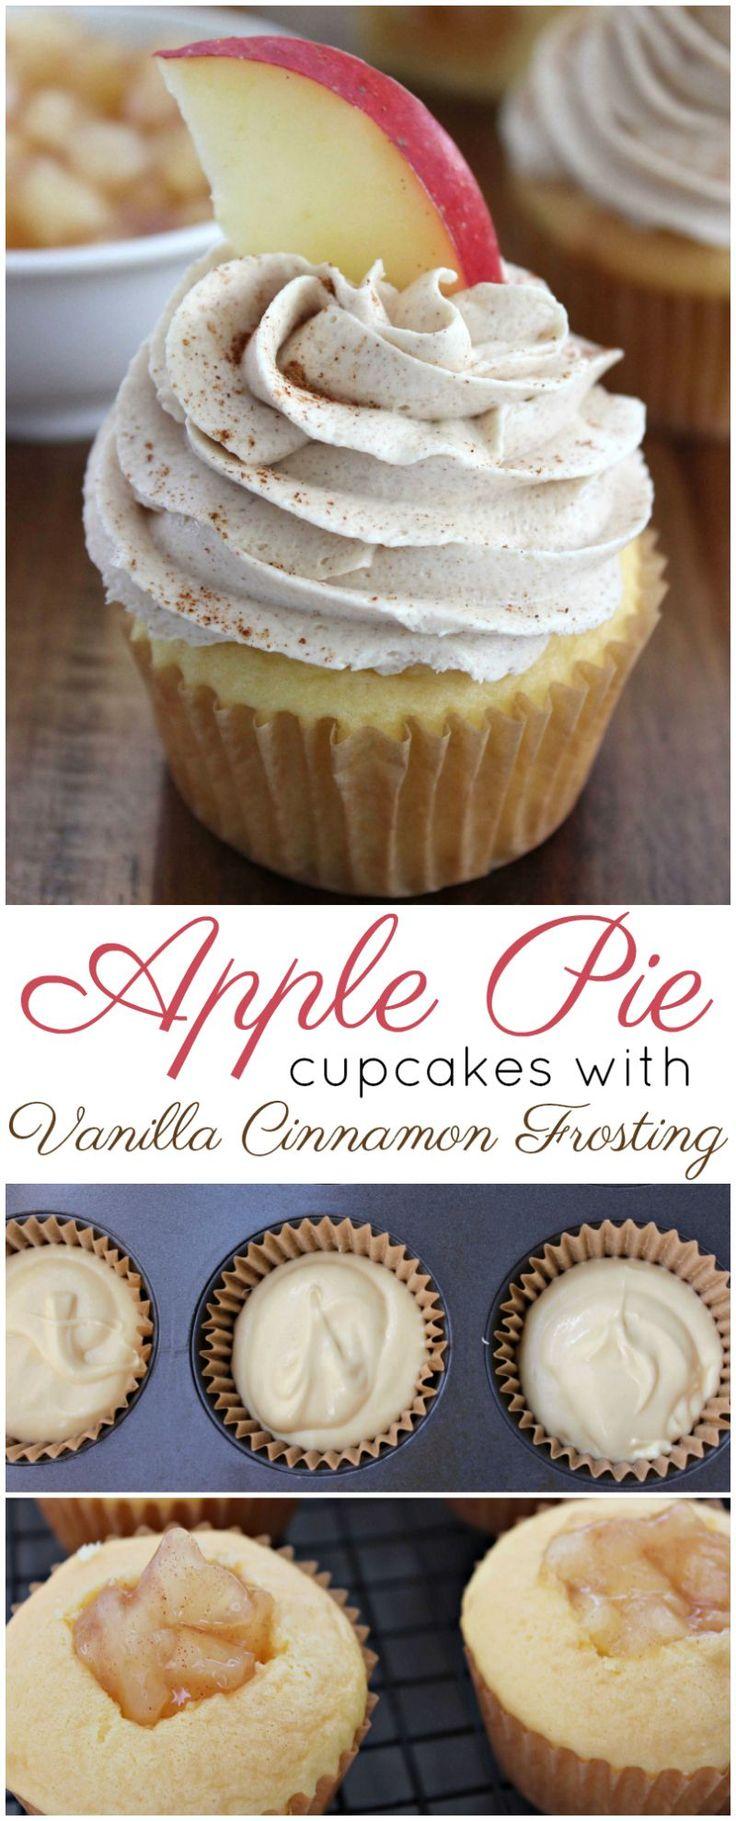 Apple Pie Cupcakes with Vanilla Cinnamon Frosting …